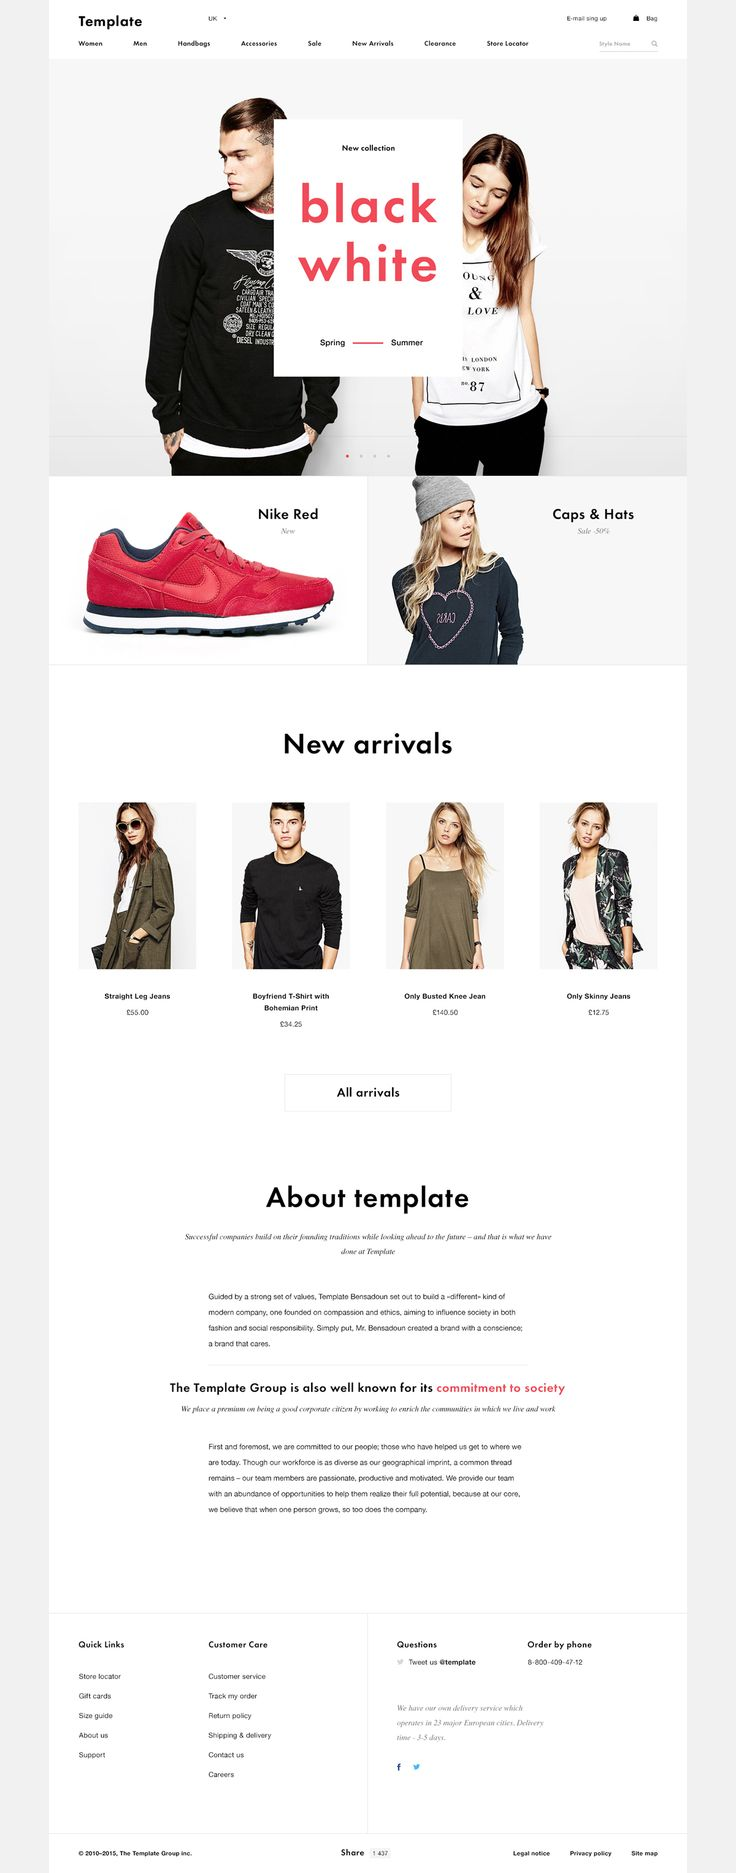 Shop Template free PSD on Behance